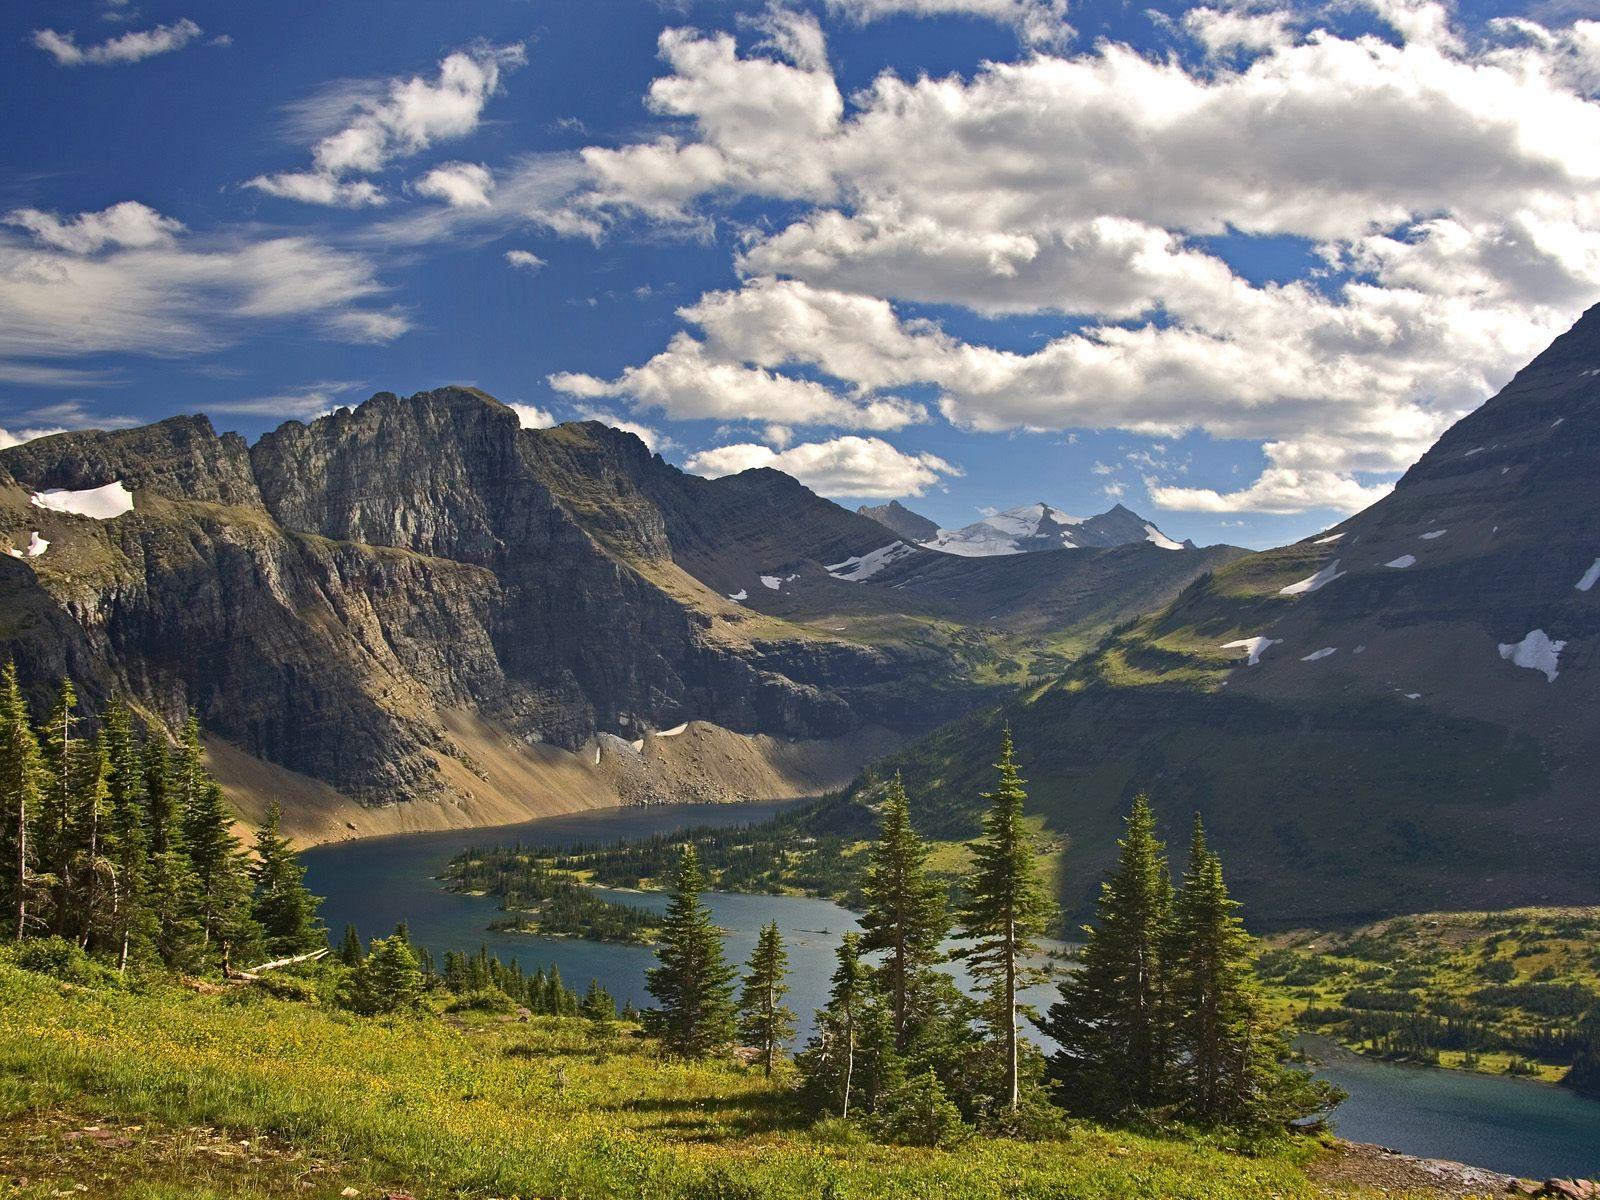 Montana Wallpaper 15865 1600x1200 px